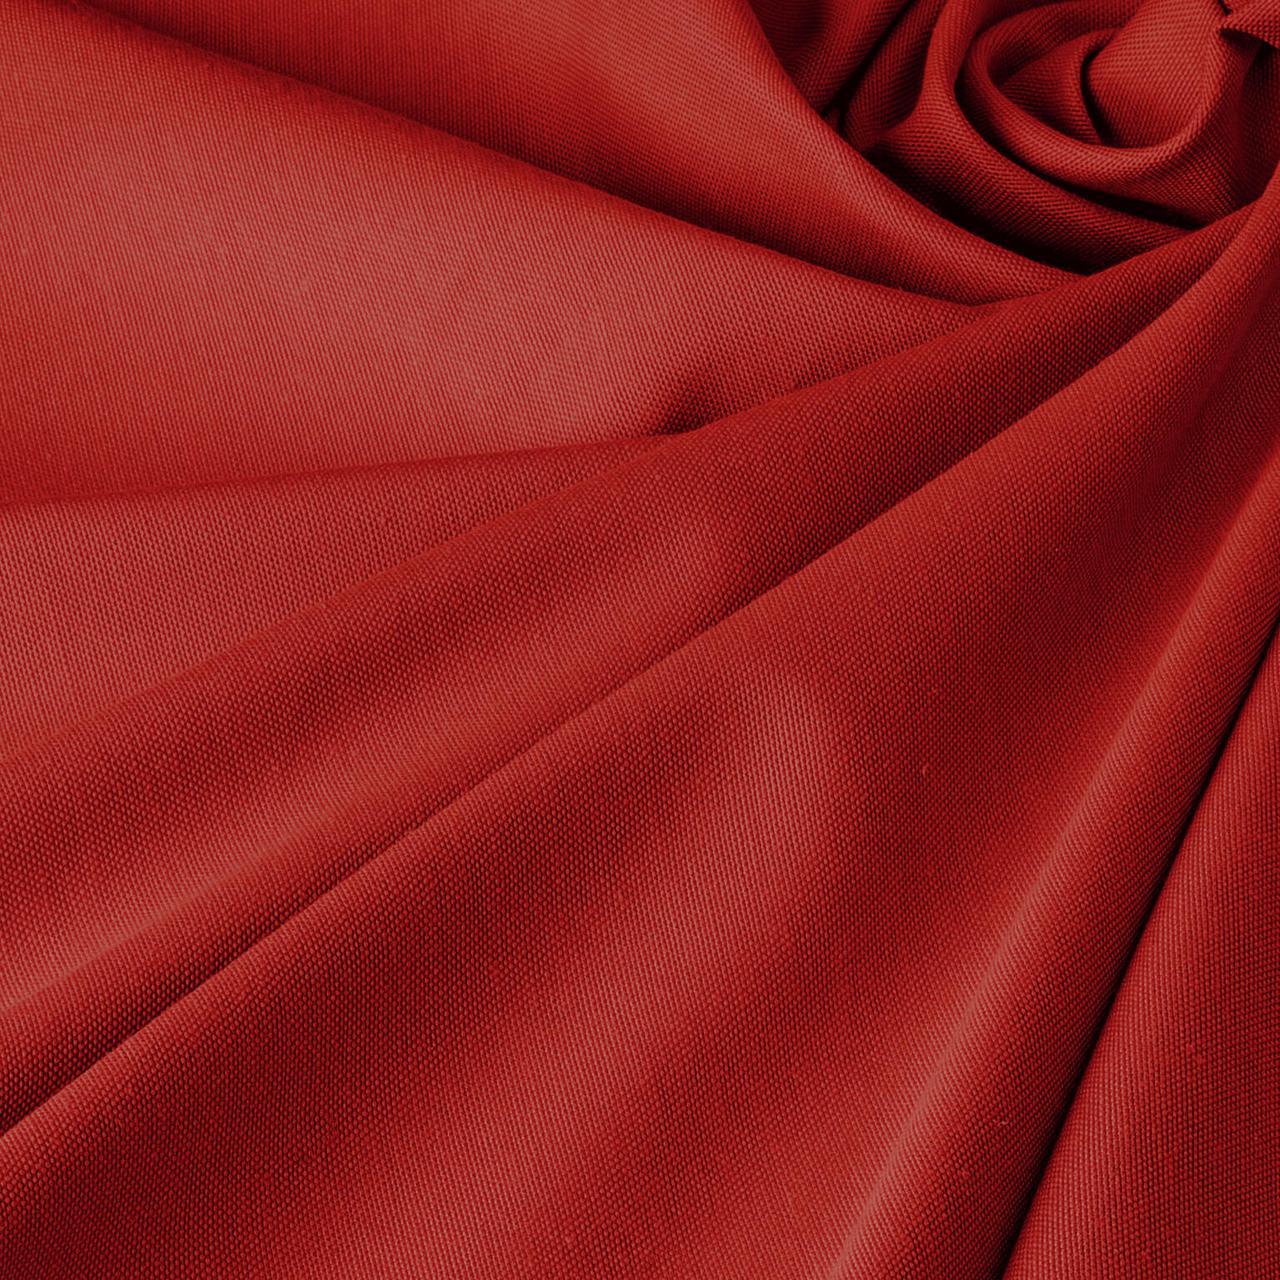 Ткань для штор и скатертей Teflon TDRK v 301